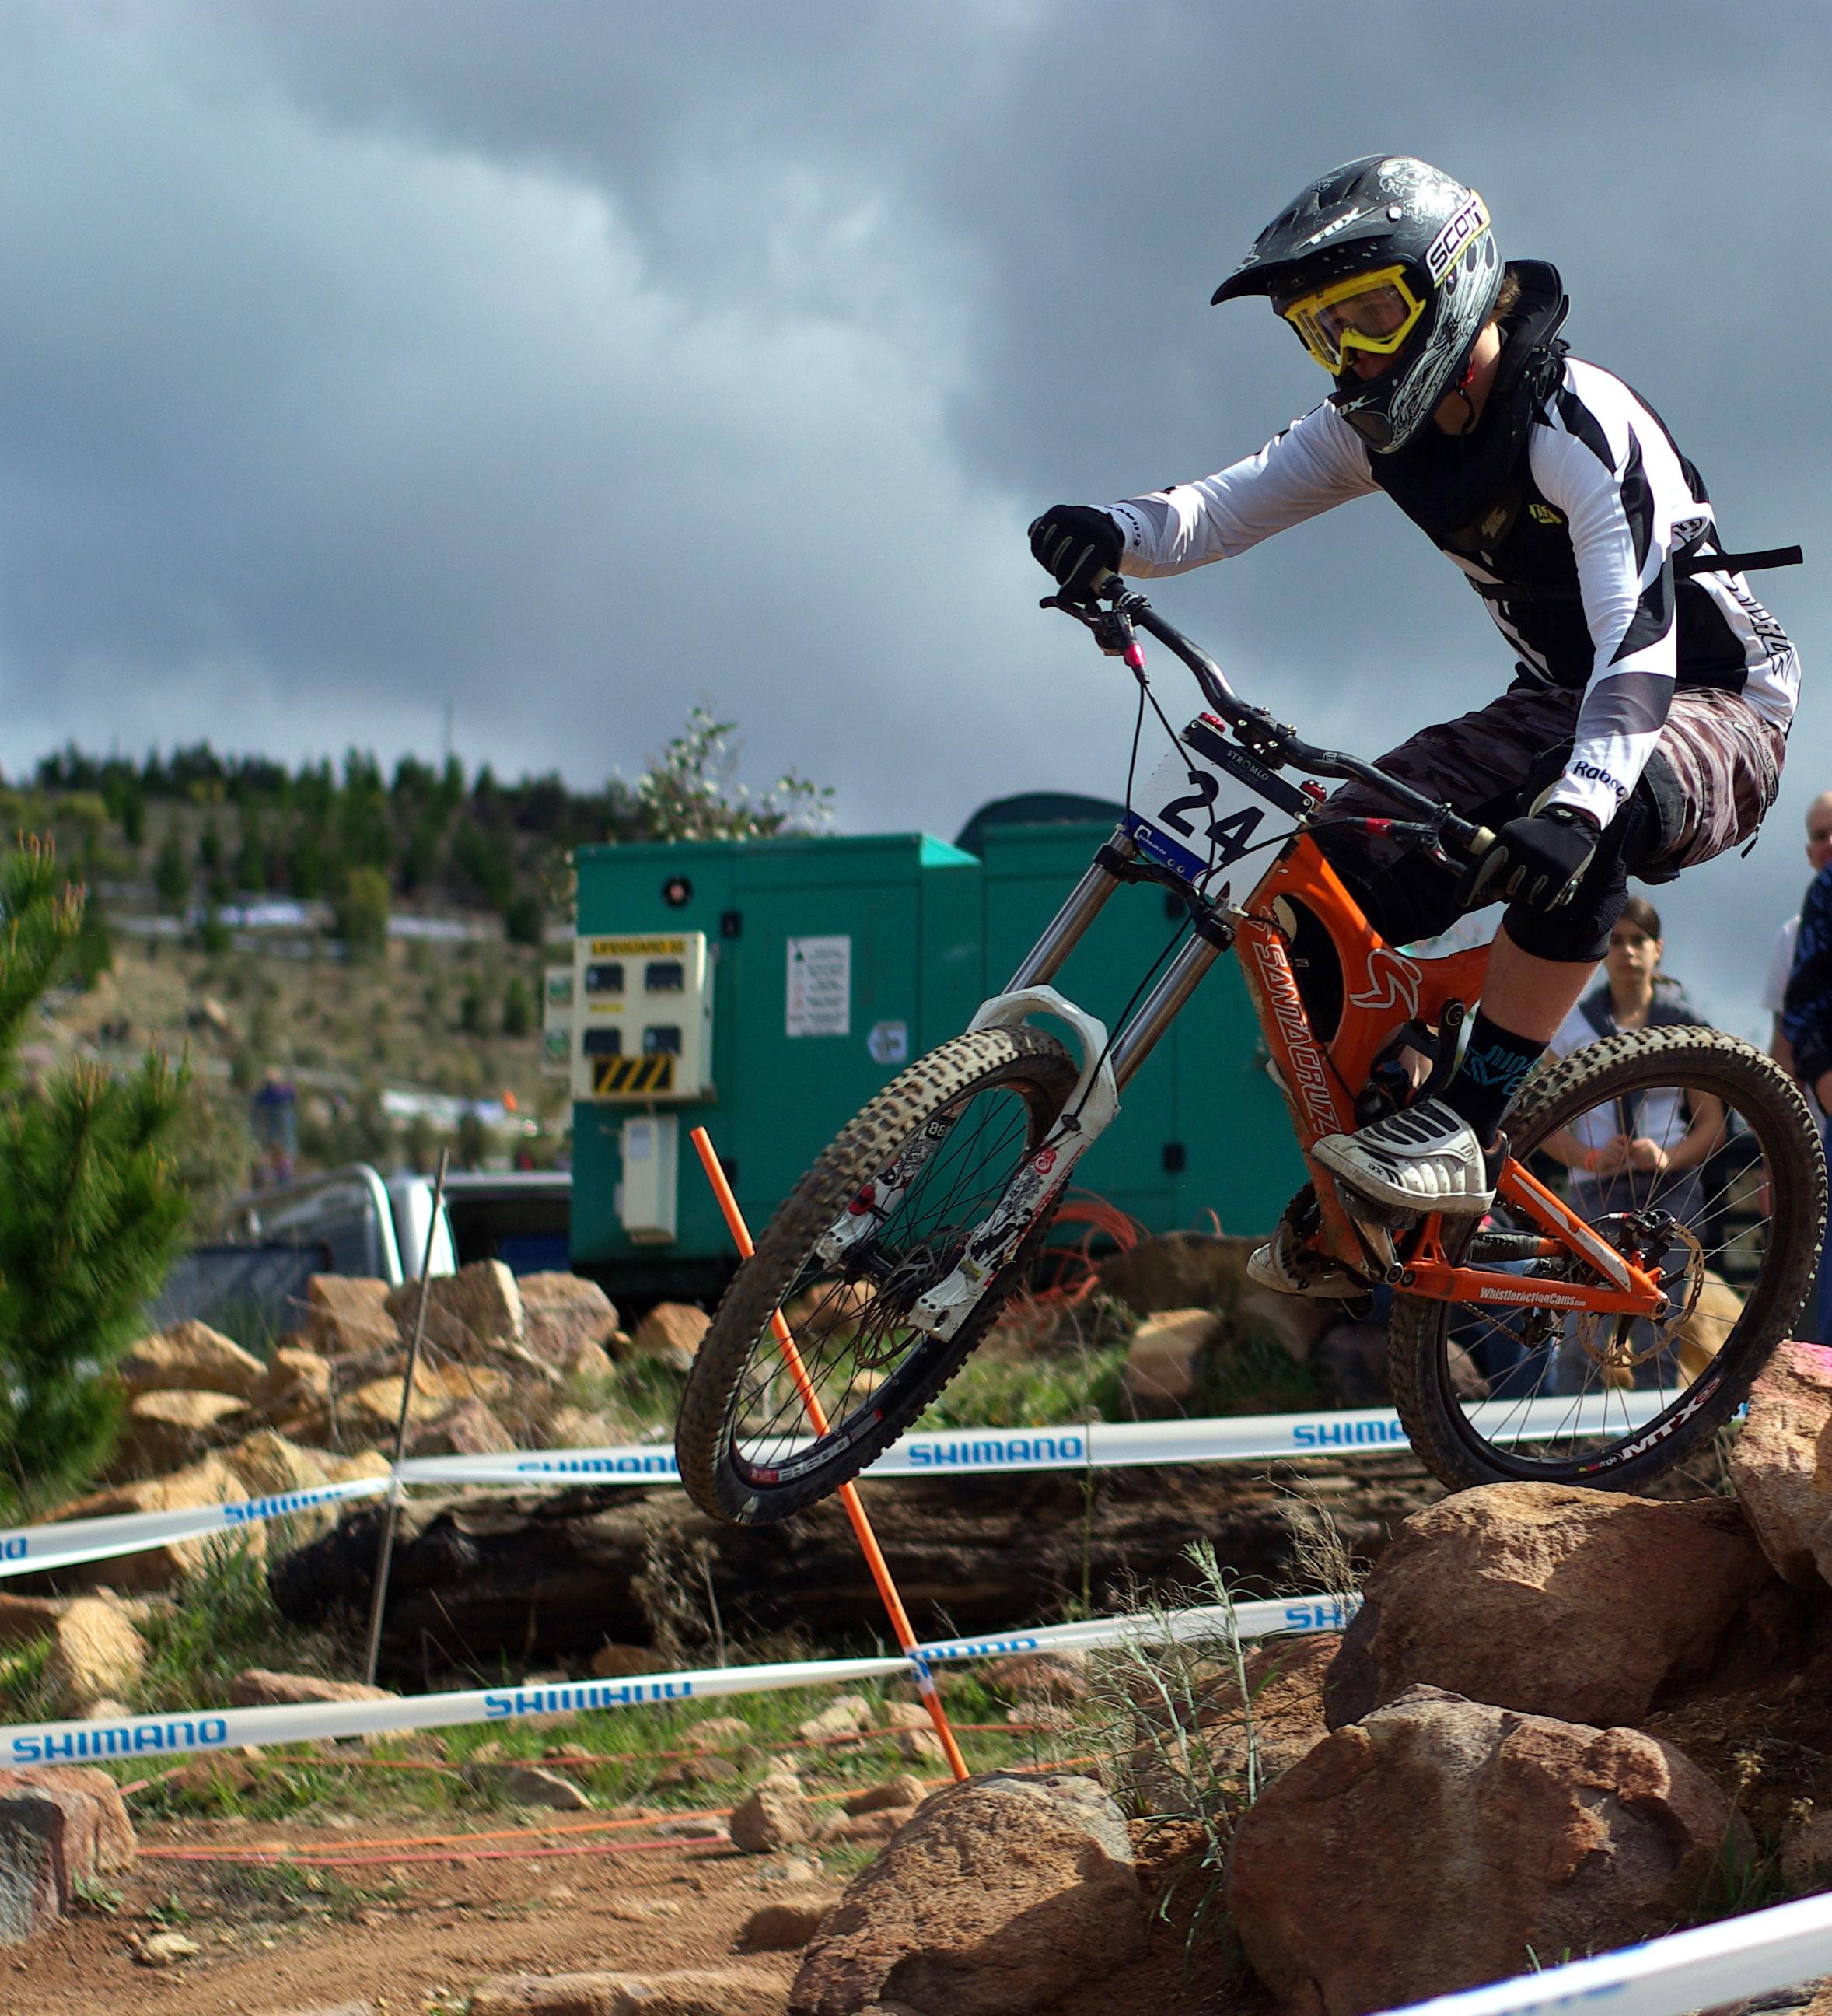 291294ef01e Downhill mountain biking - Wikipedia